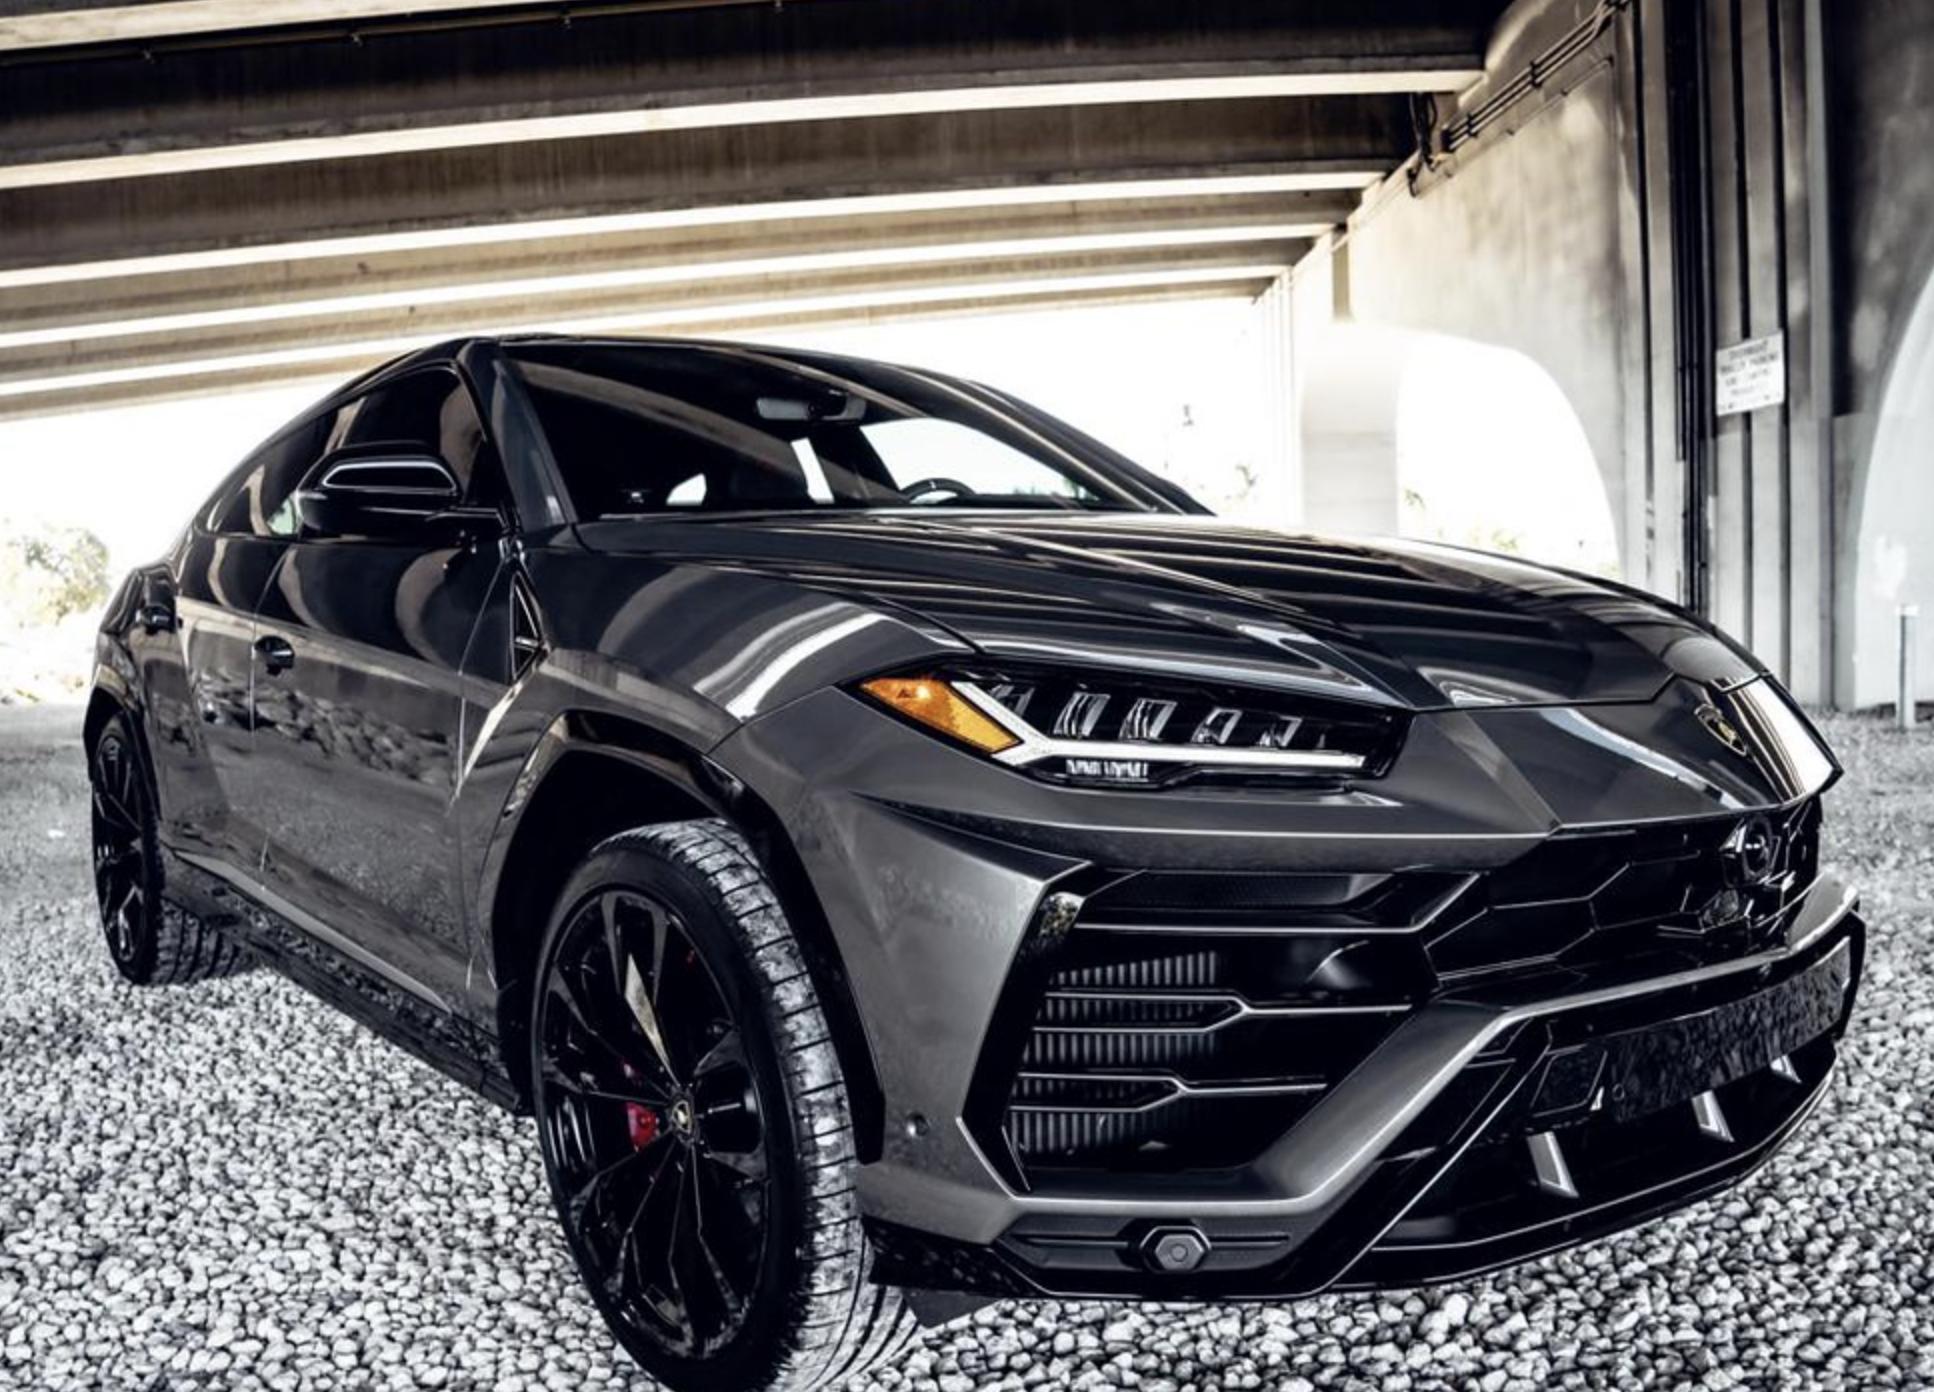 Image #1 of our  2021 Lamborghini Urus - Silver    In Miami Fort Lauderdale Palm Beach South Florida